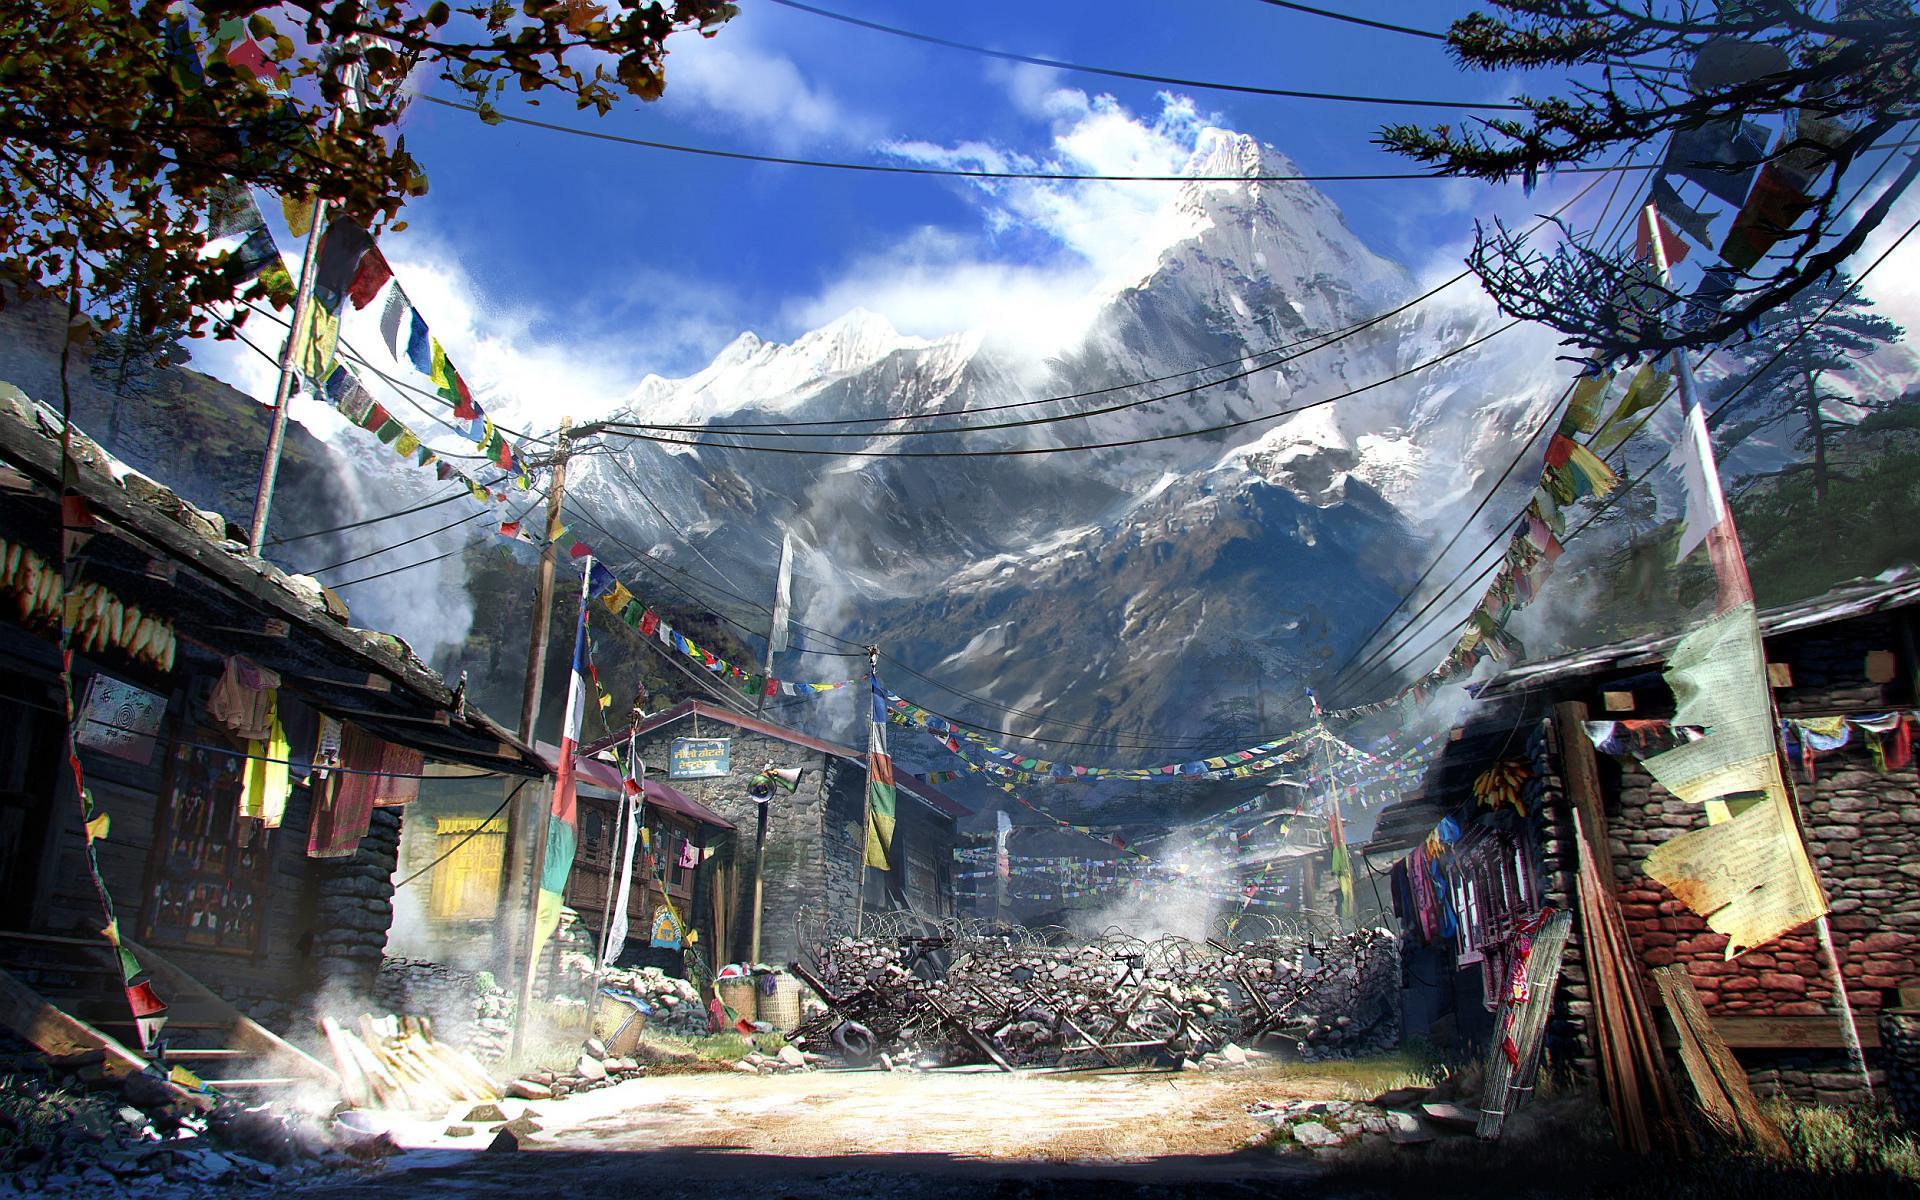 farcry4_himalayas_nepal